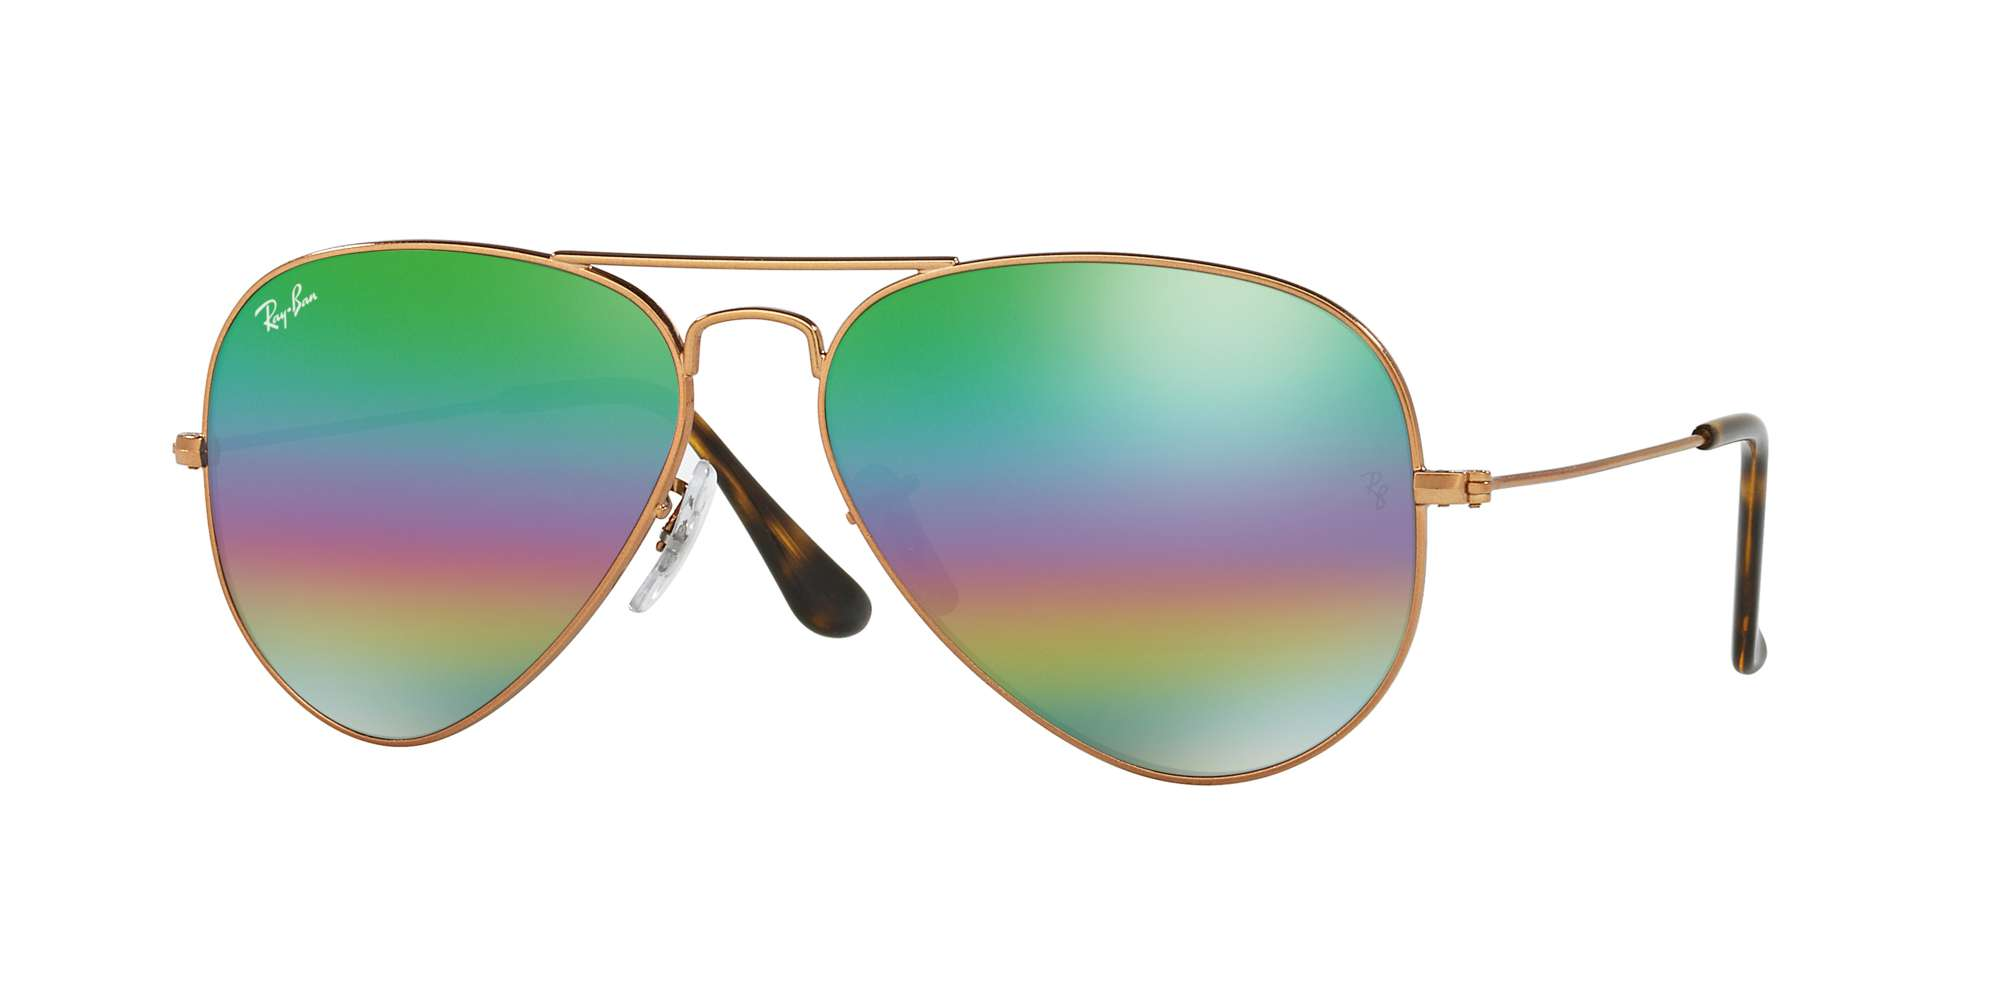 METLALLIC MEDIUM BRONZE / LIGHT GREY MIRROR RAINBOW 2 lenses